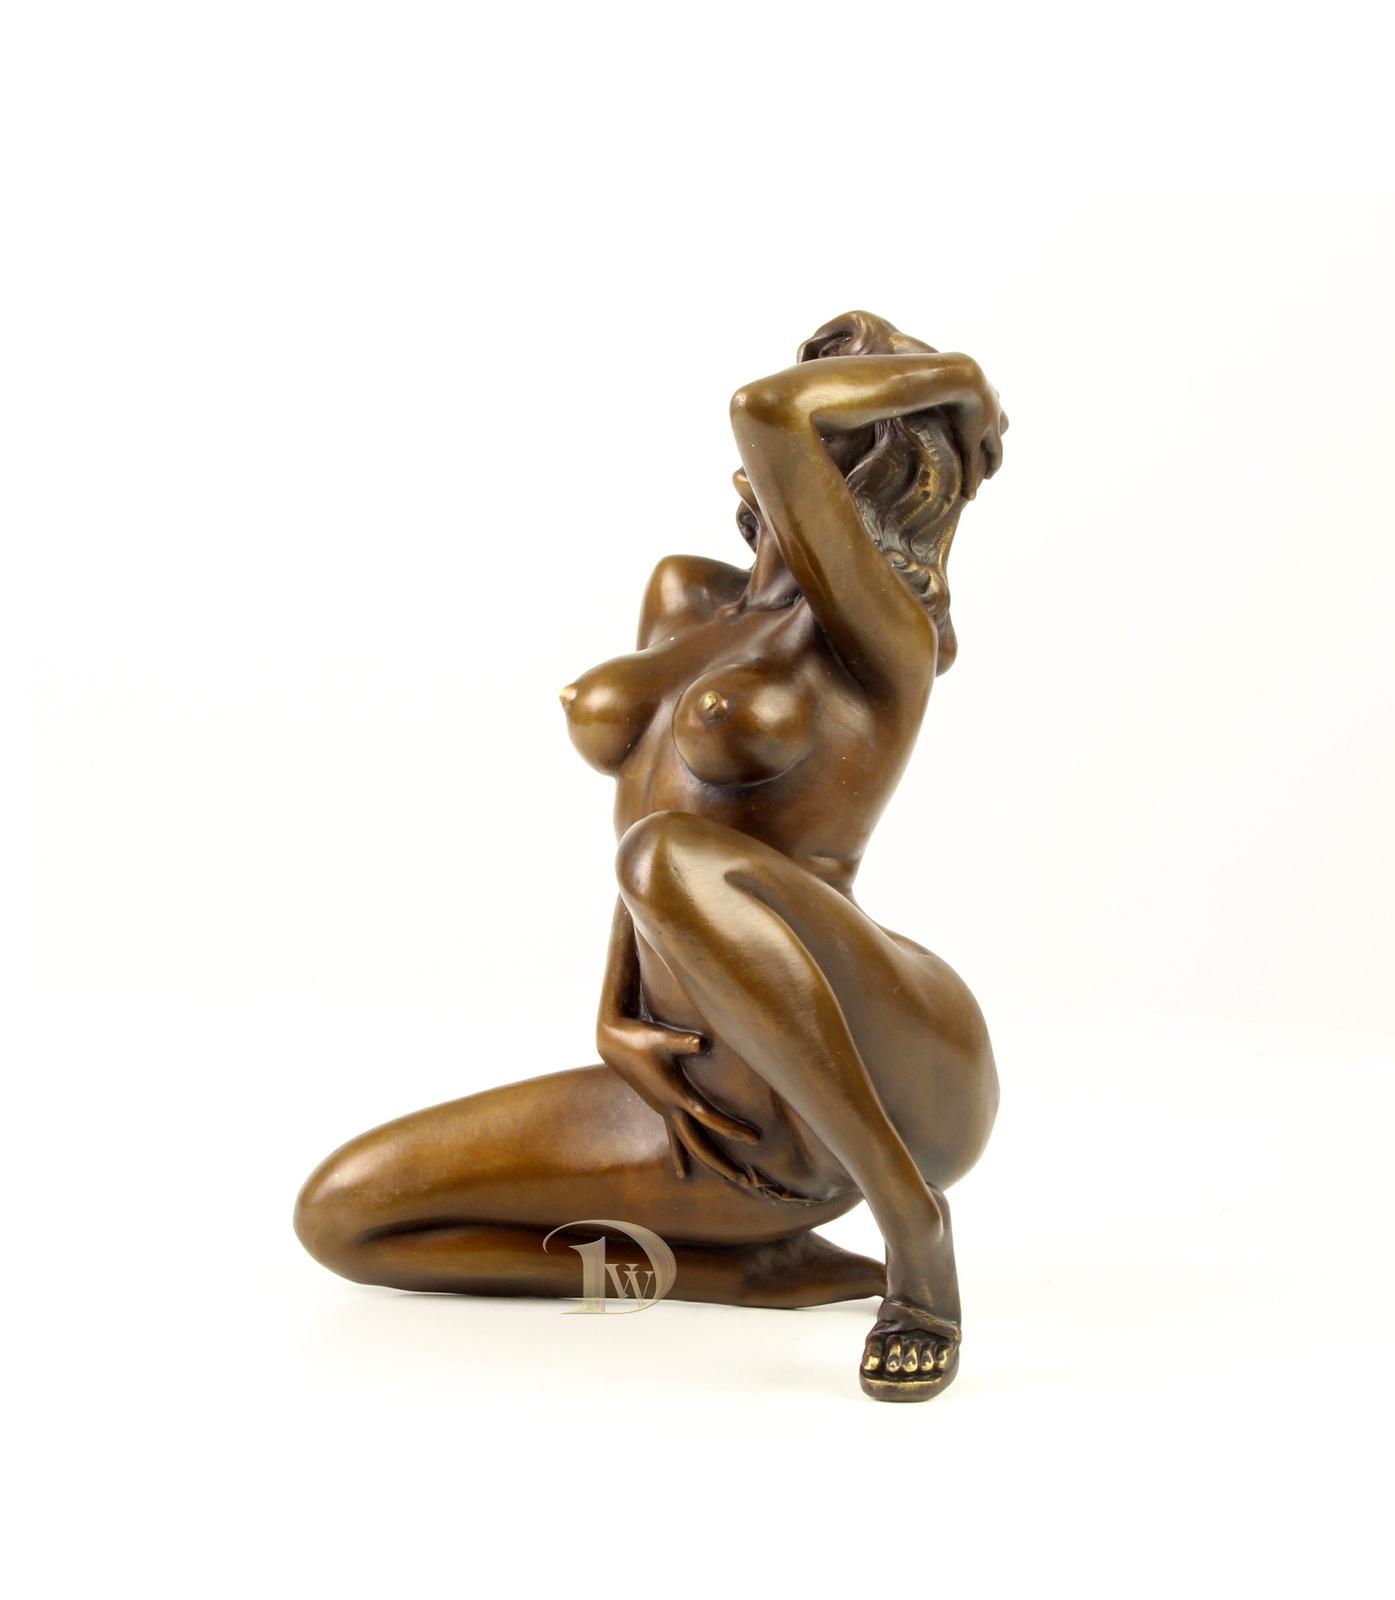 Antique Home Decor Bronze Sculpture Erotic Bronze Femme Fatale Free Air Shipping